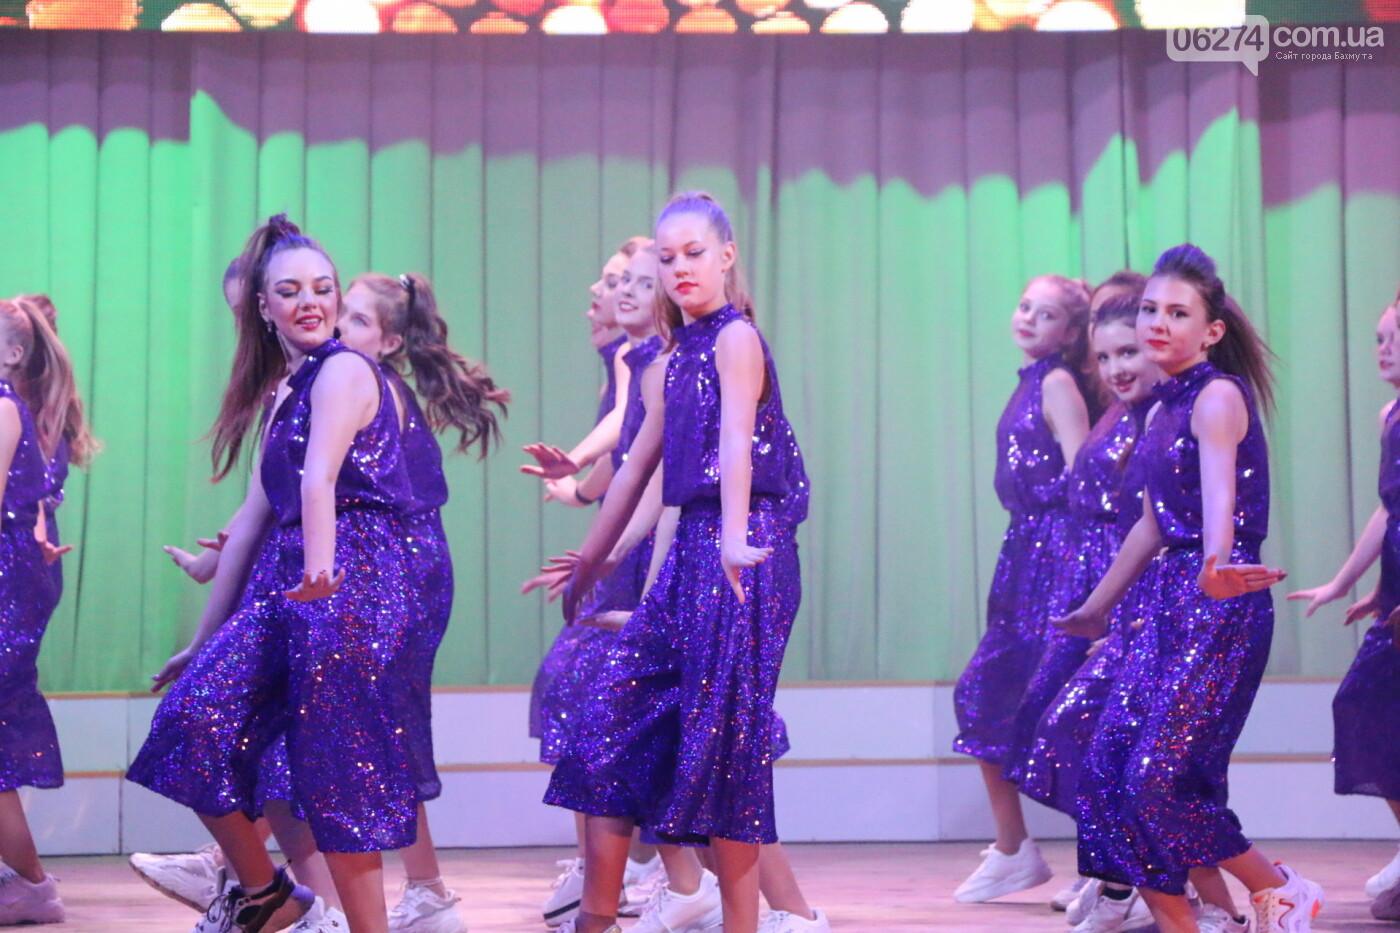 В Бахмуте провели Disco House Party (ФОТООТЧЕТ), фото-9